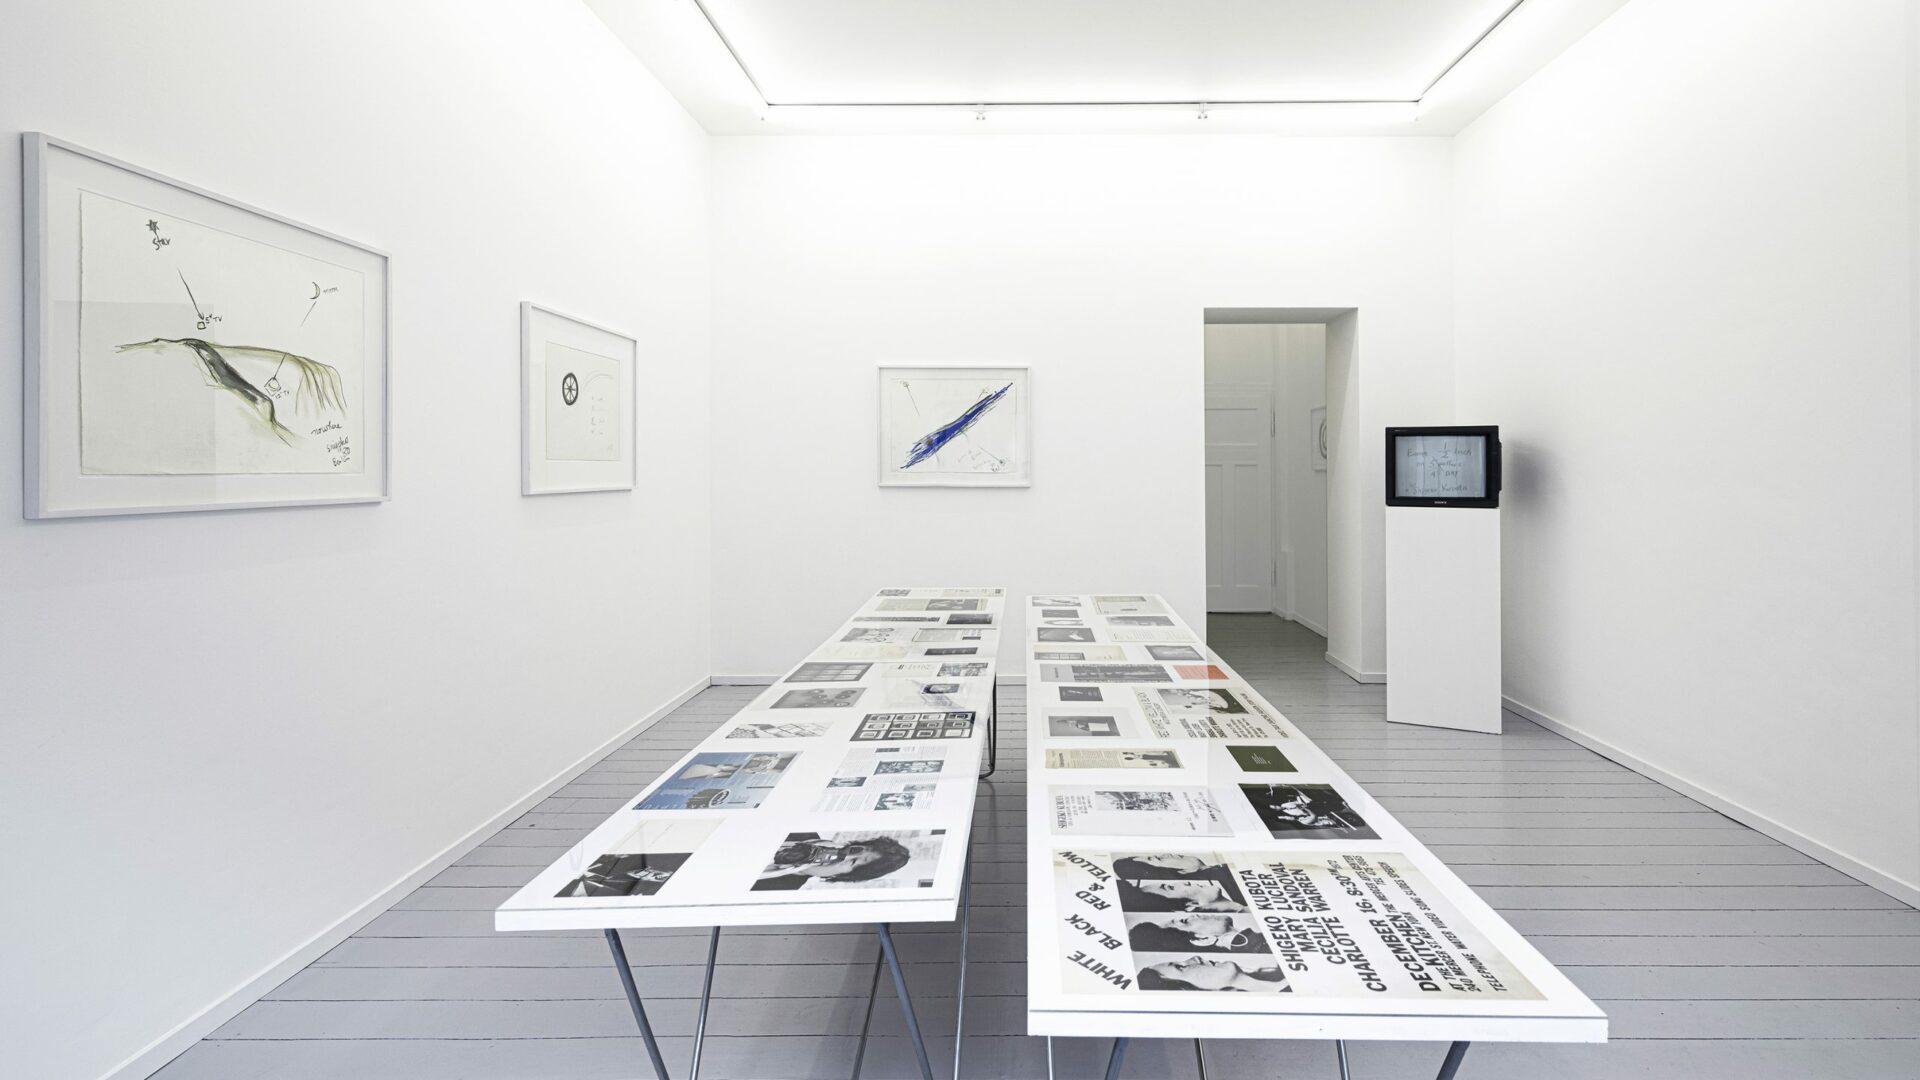 Shigeko Kubota | a woman artist,her life, exhibiton basedonart gallery düsseldorf